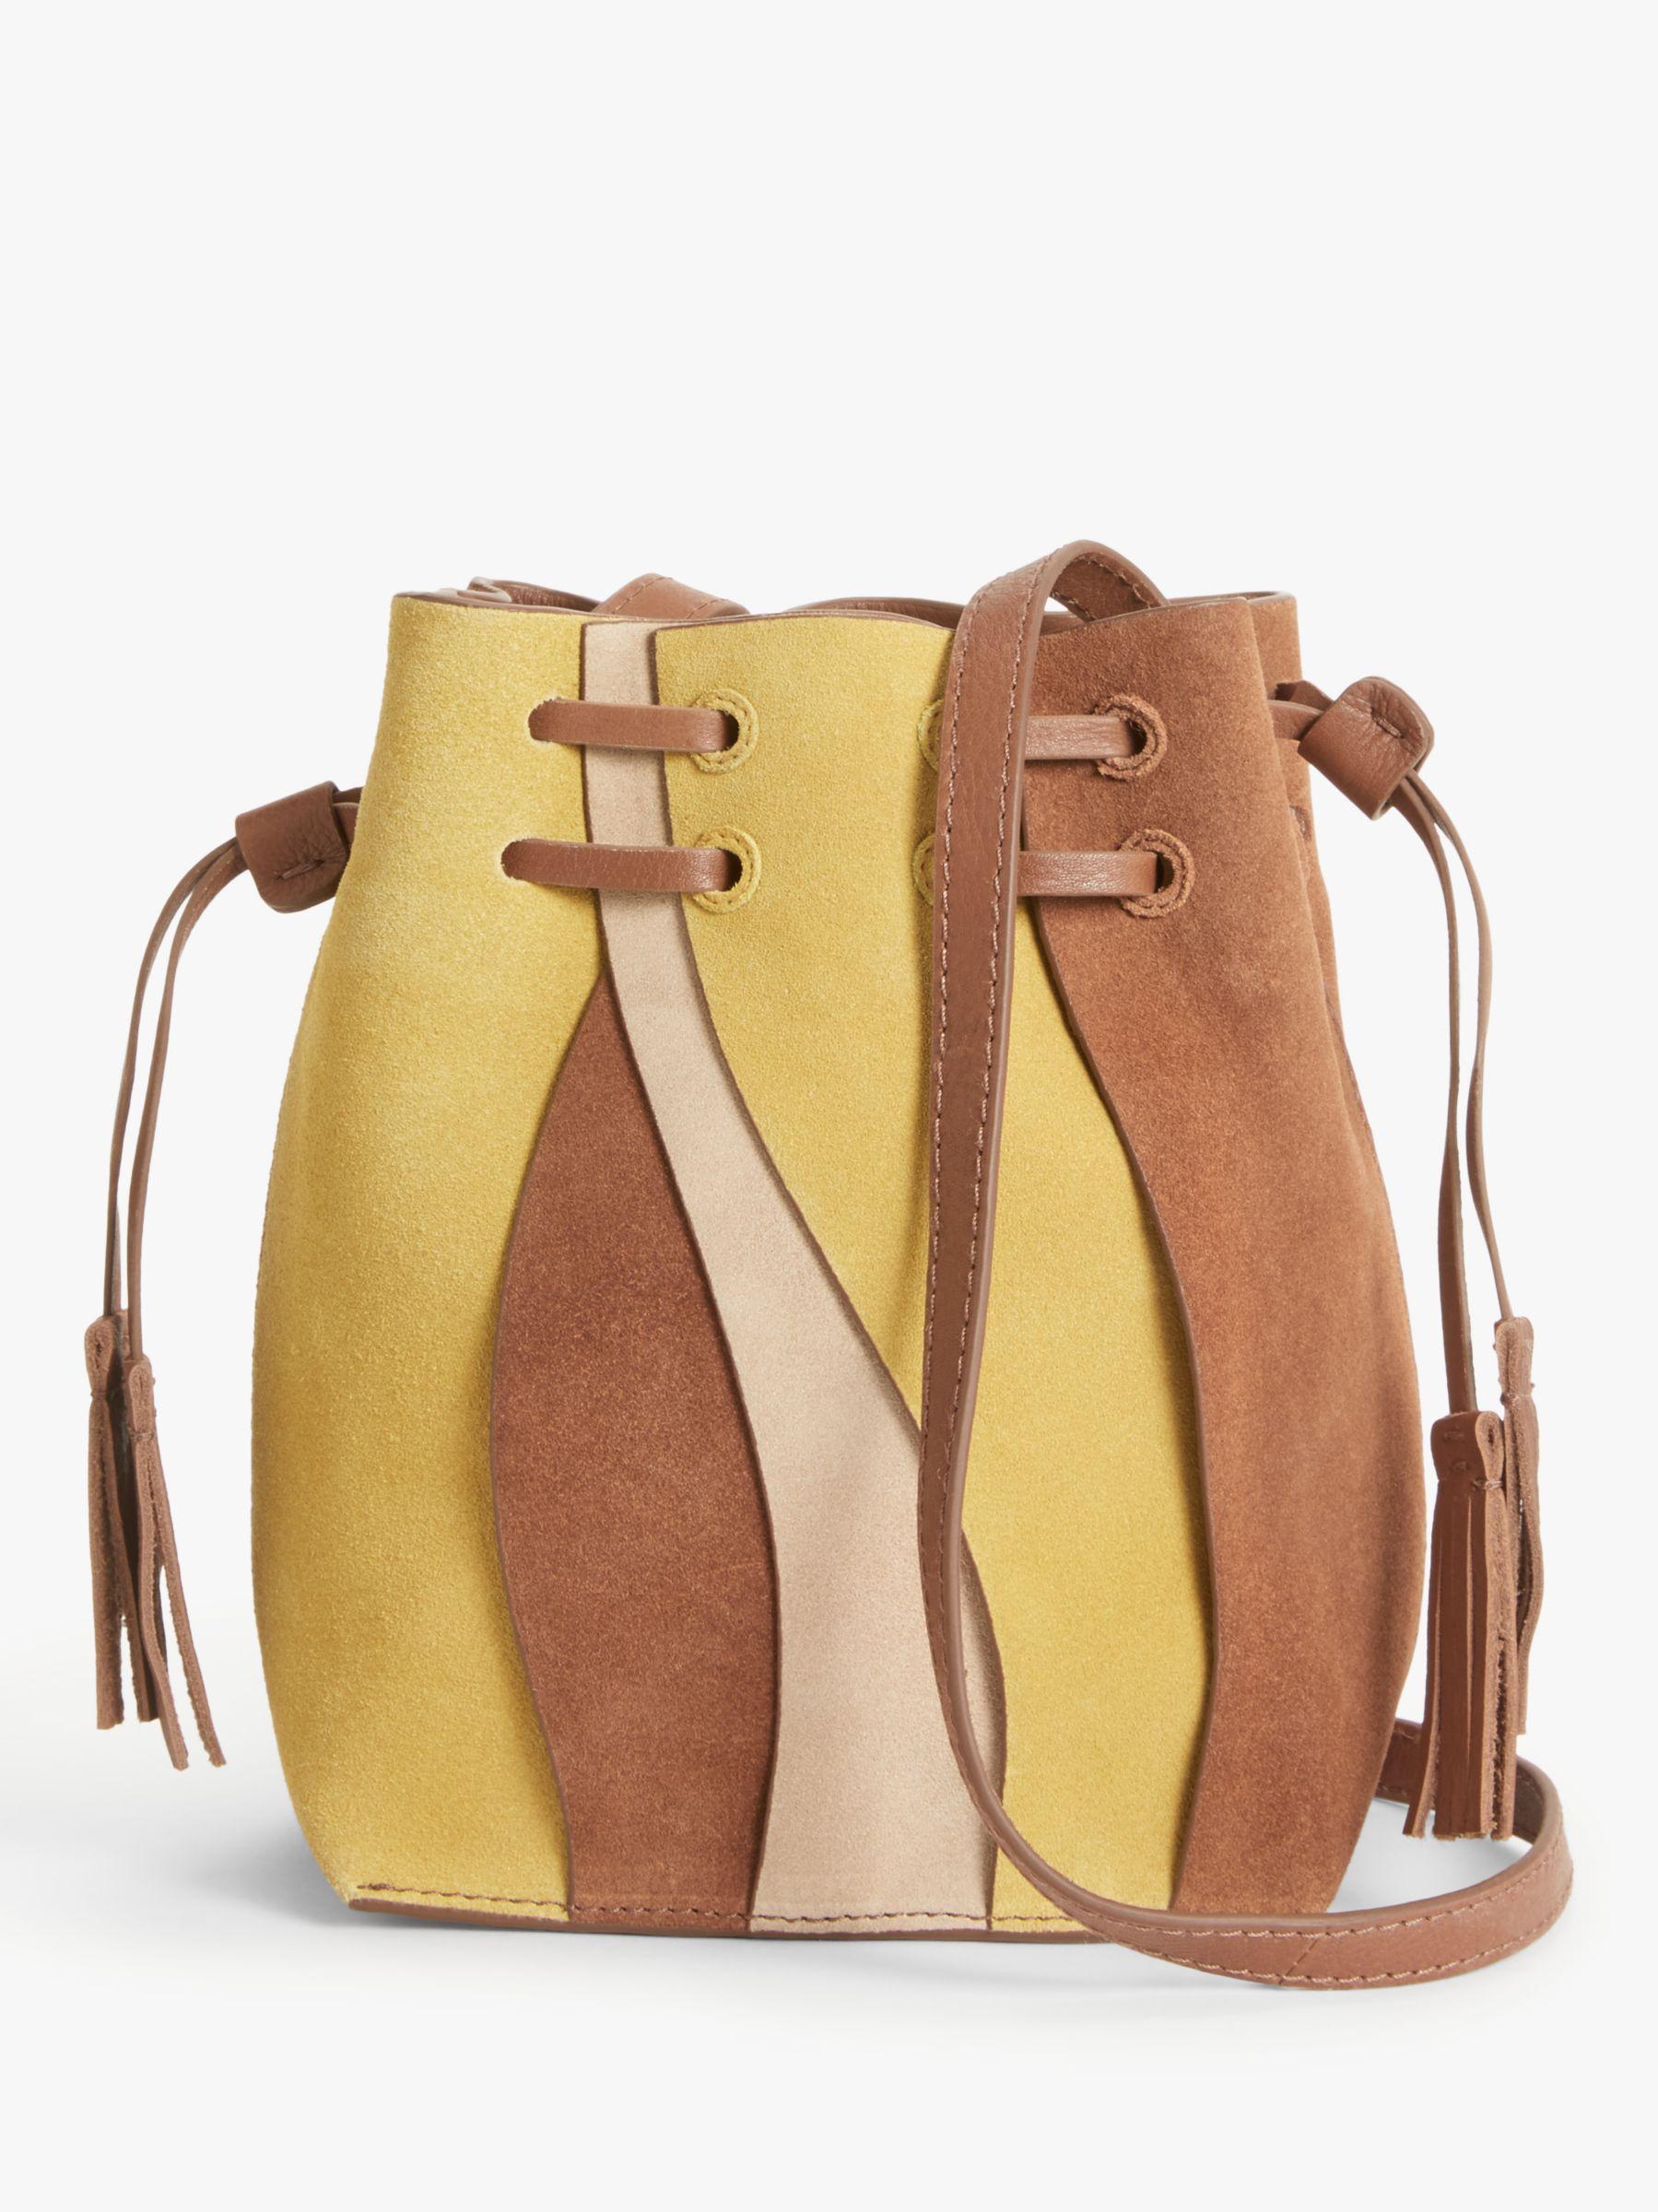 AND/OR Suede Drawstring Bucket Bag, Tan at John Lewis & Partners